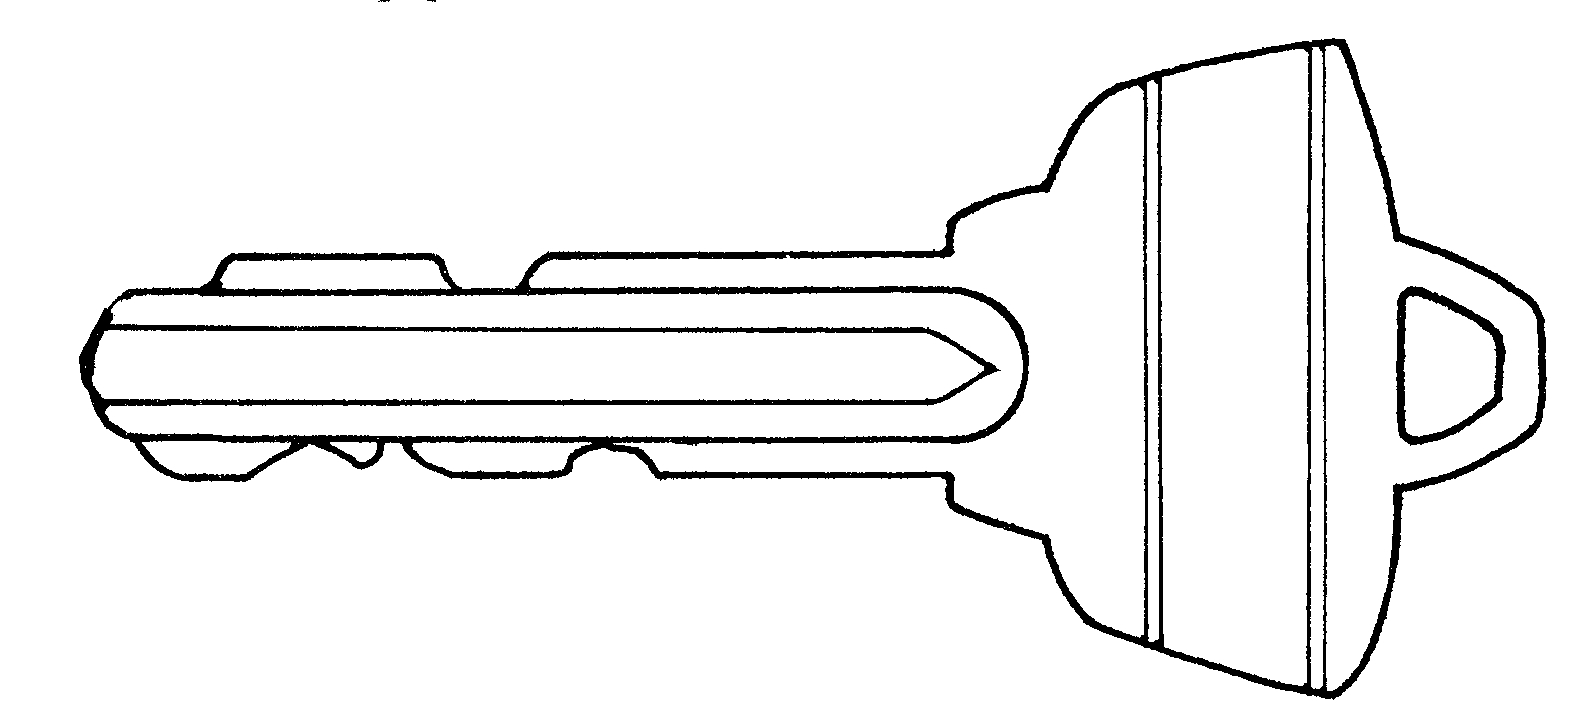 Key clip art free clipart images 2 3